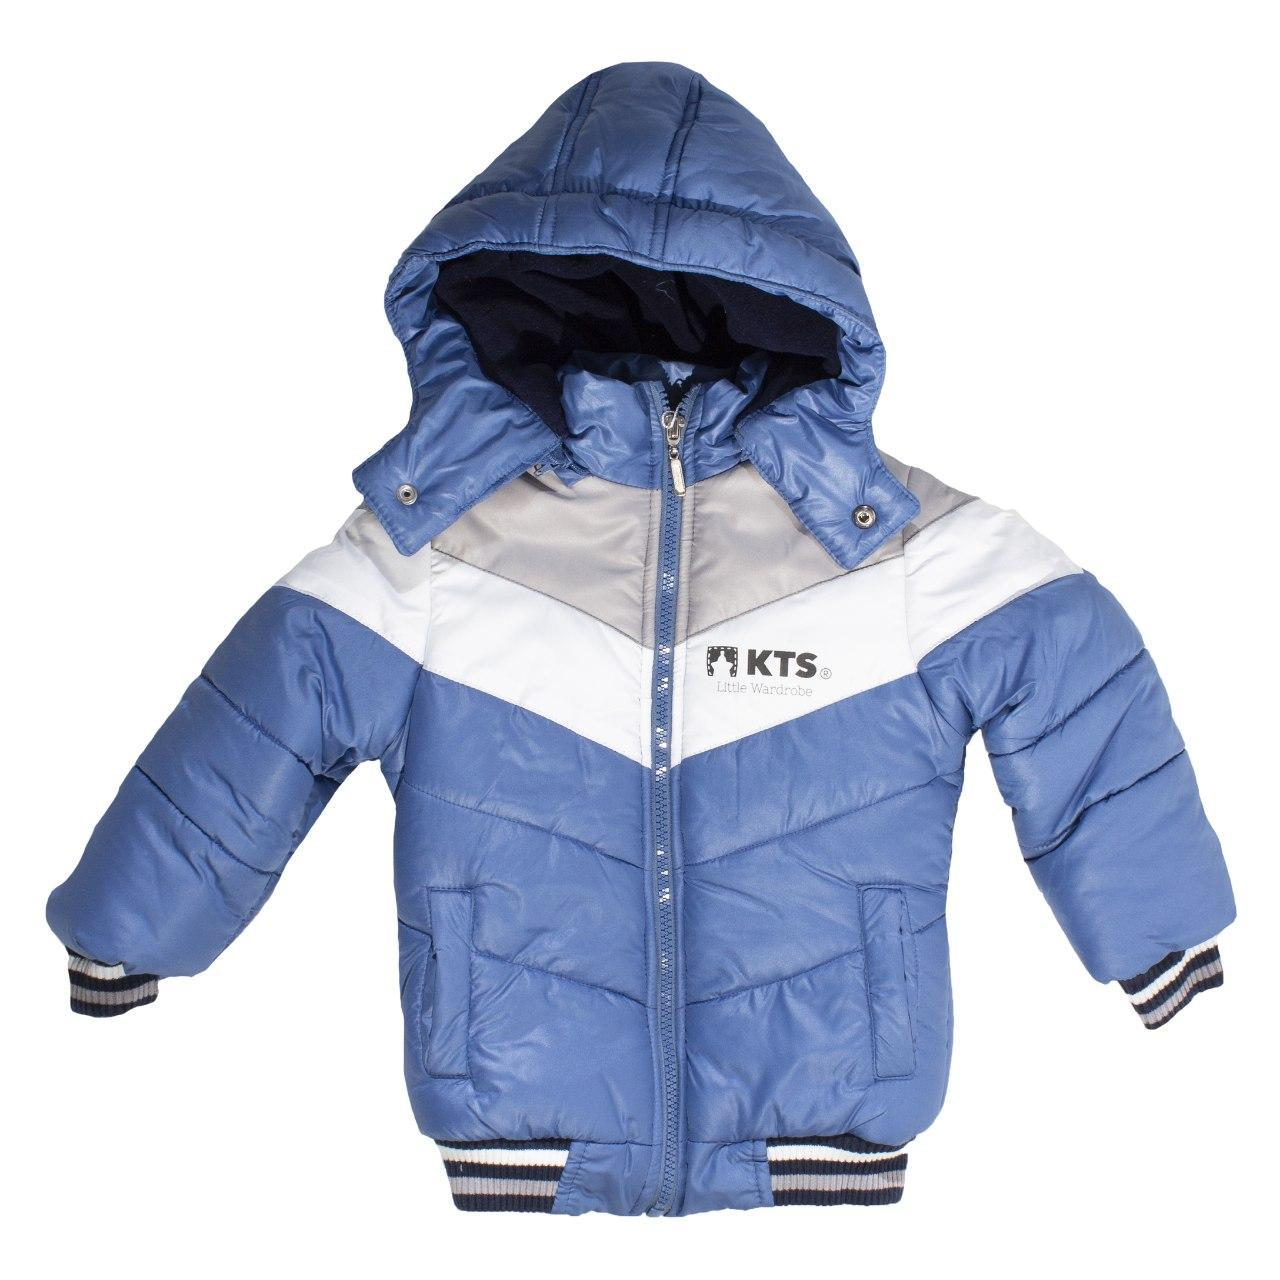 Зимняя куртка для мальчика, еврозима, размер 4 года